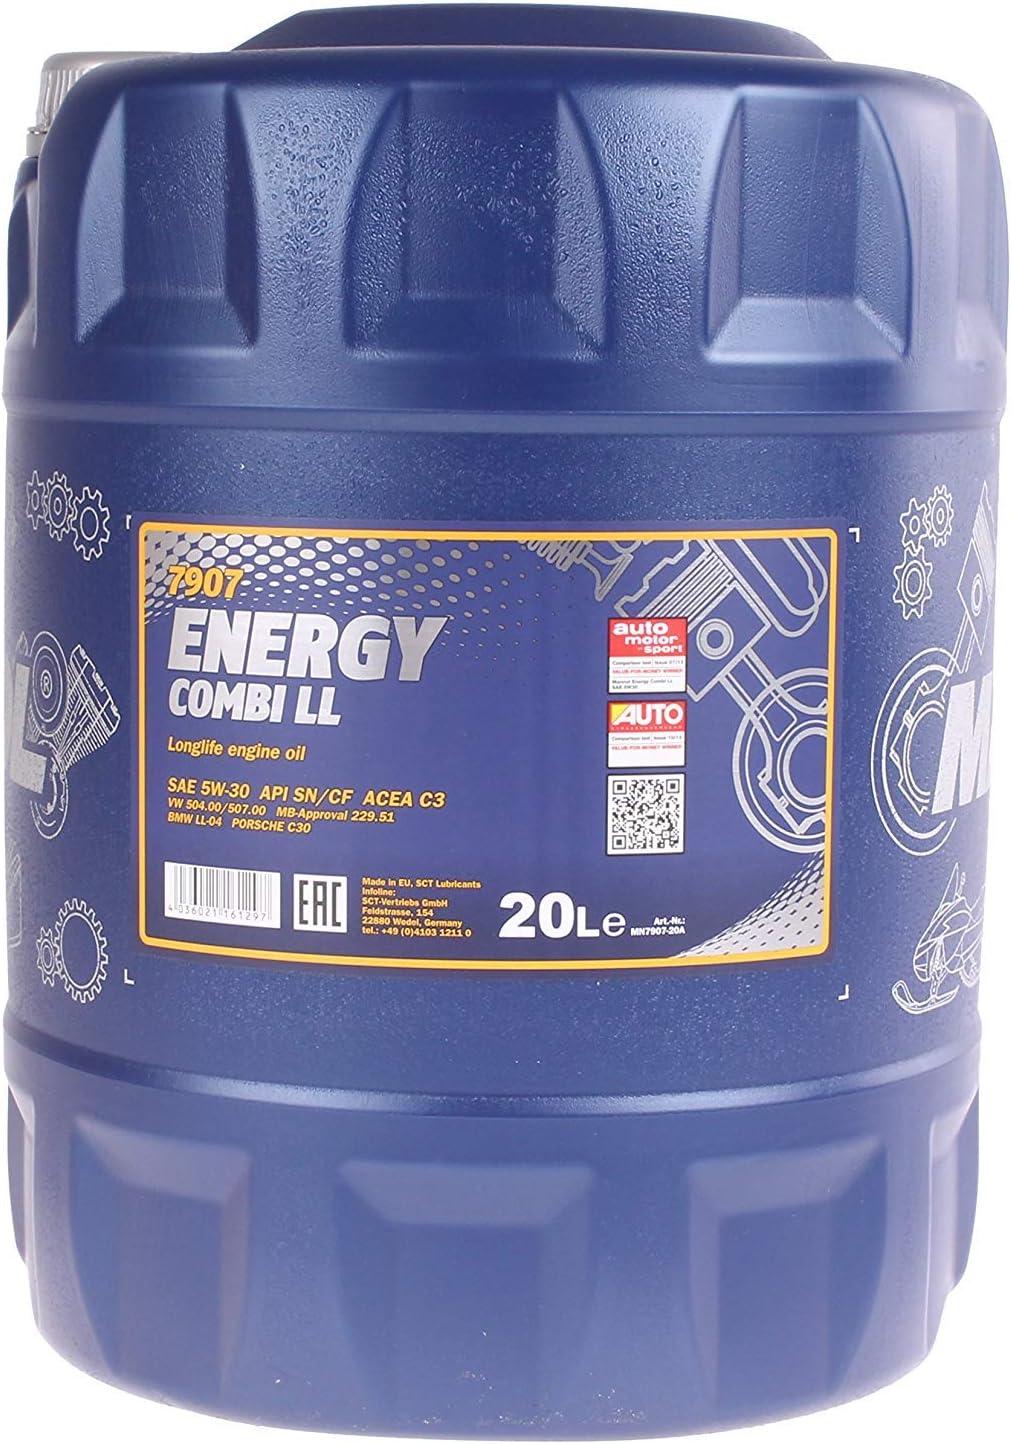 Mannol Energy Combi Ll 5w 30 Api Sn Cf Motorenöl 20 Liter Auto